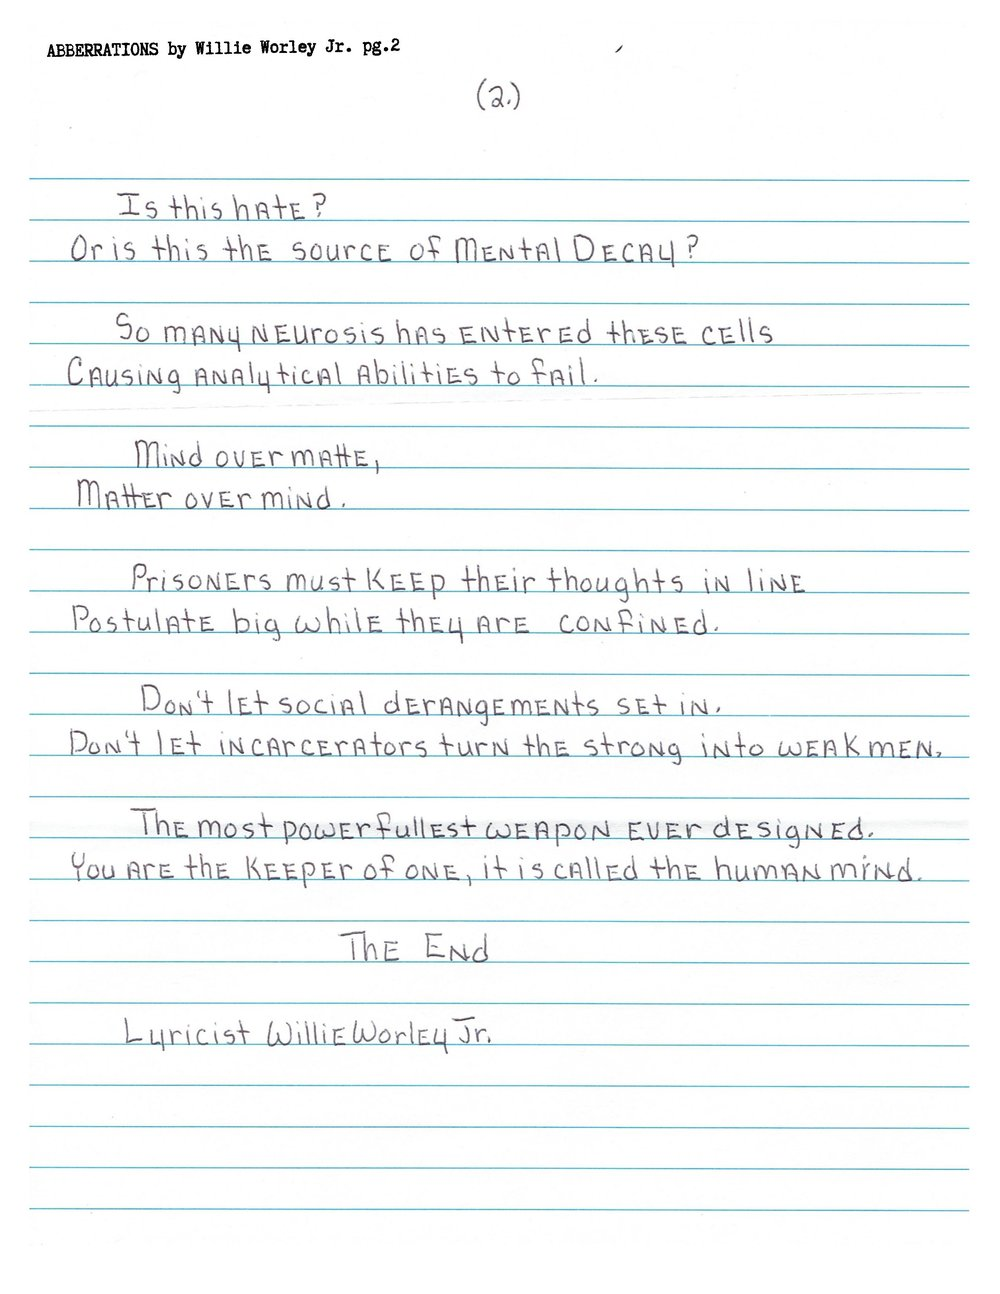 SLFH_vol_1-page-014.jpg